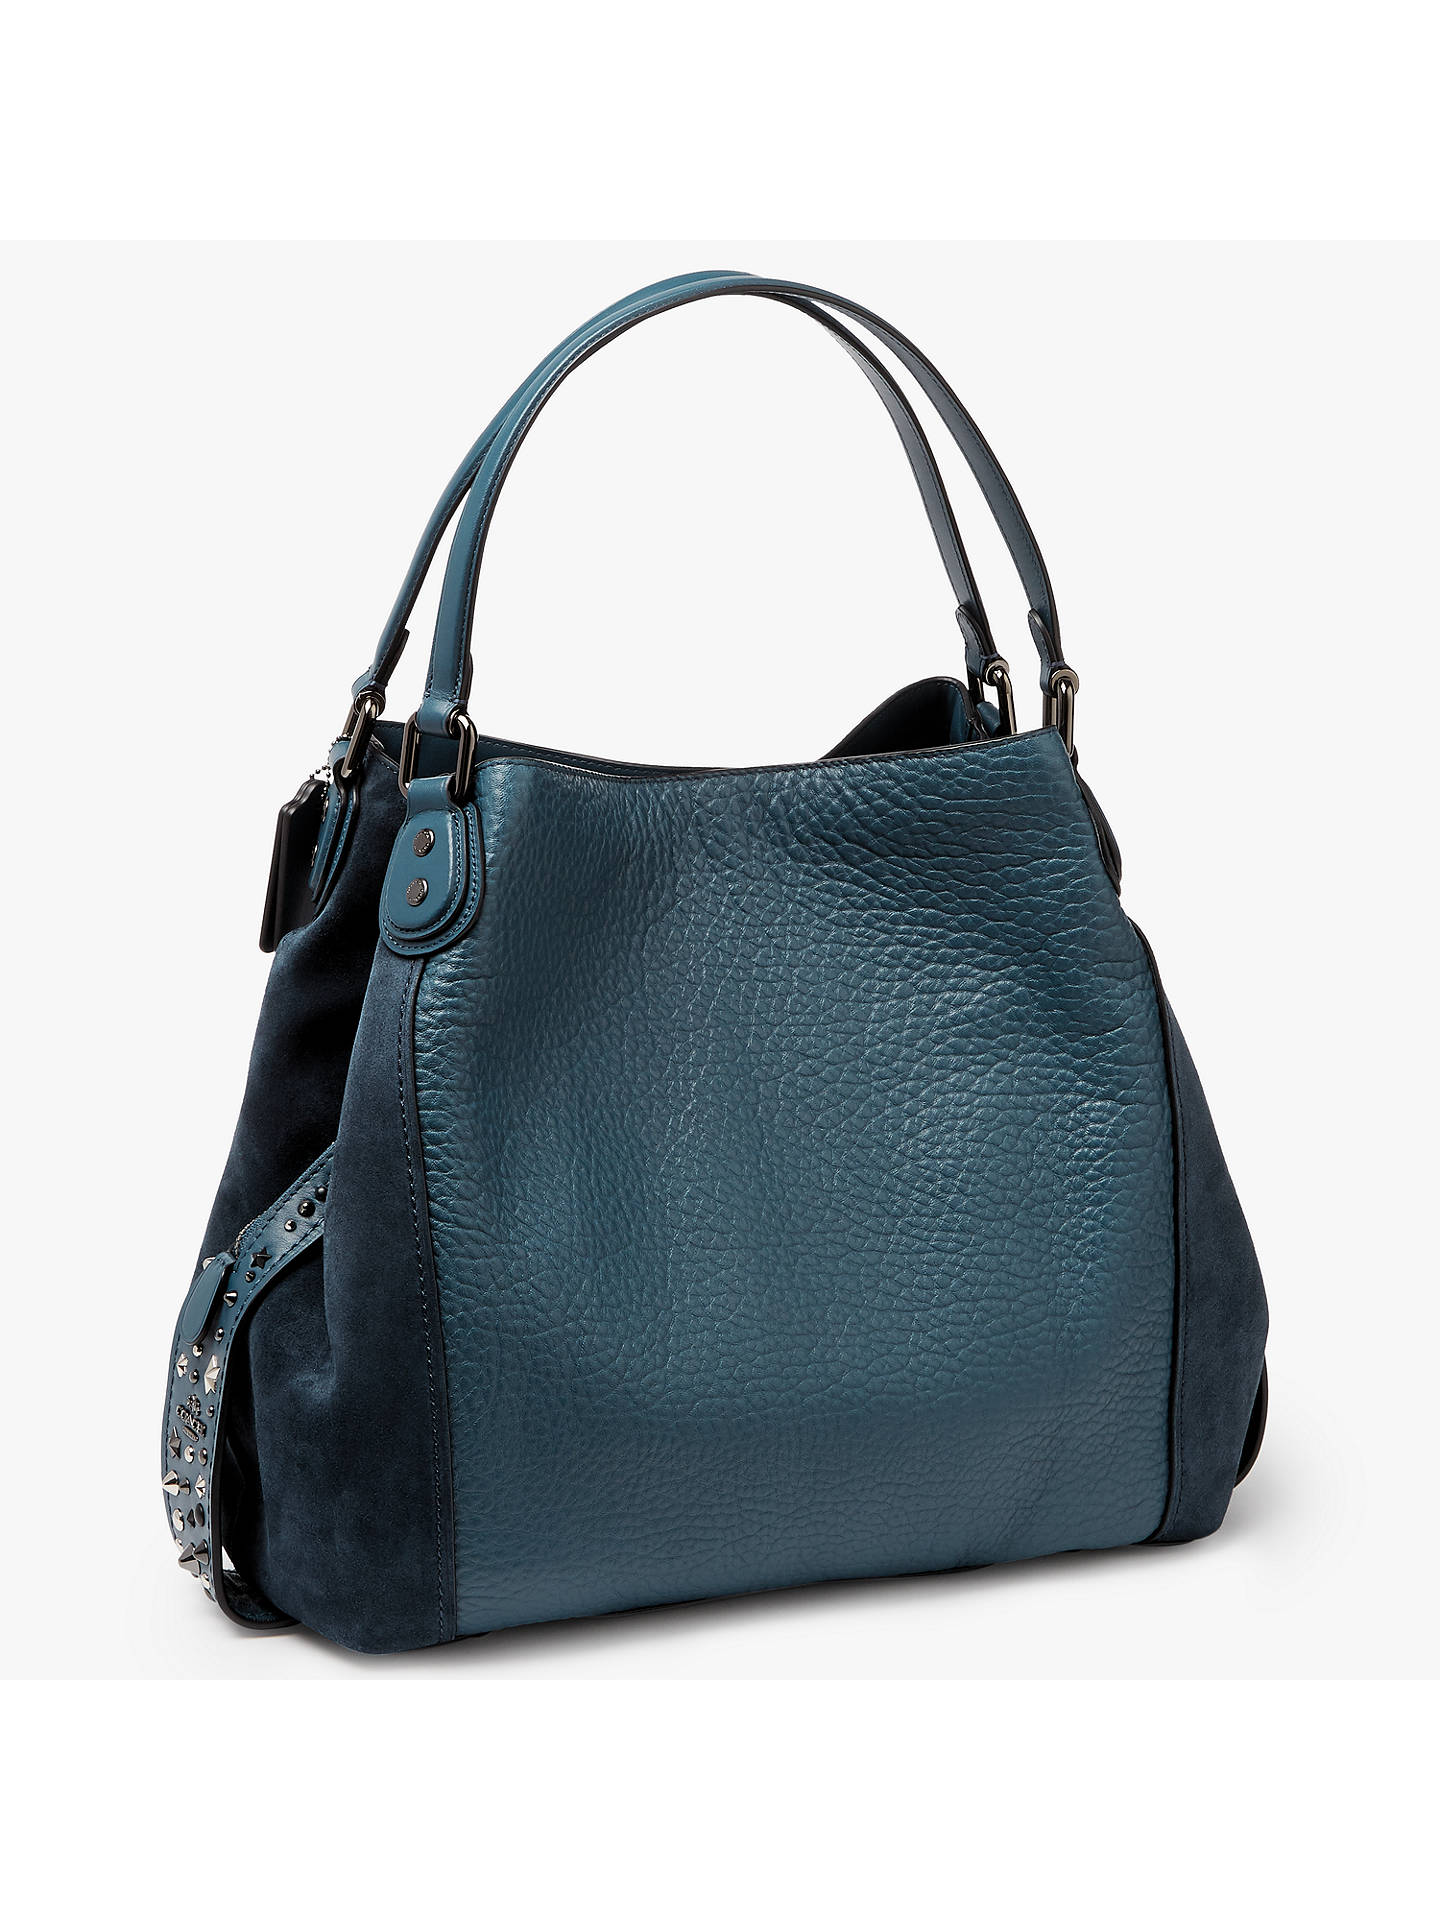 643d0cd14c14 Buy Coach Edie 42 Leather Shoulder Bag